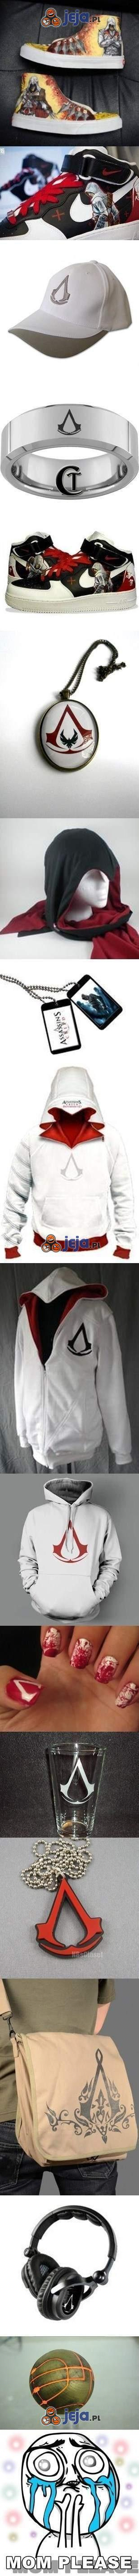 Gadżety Assassin's Creed